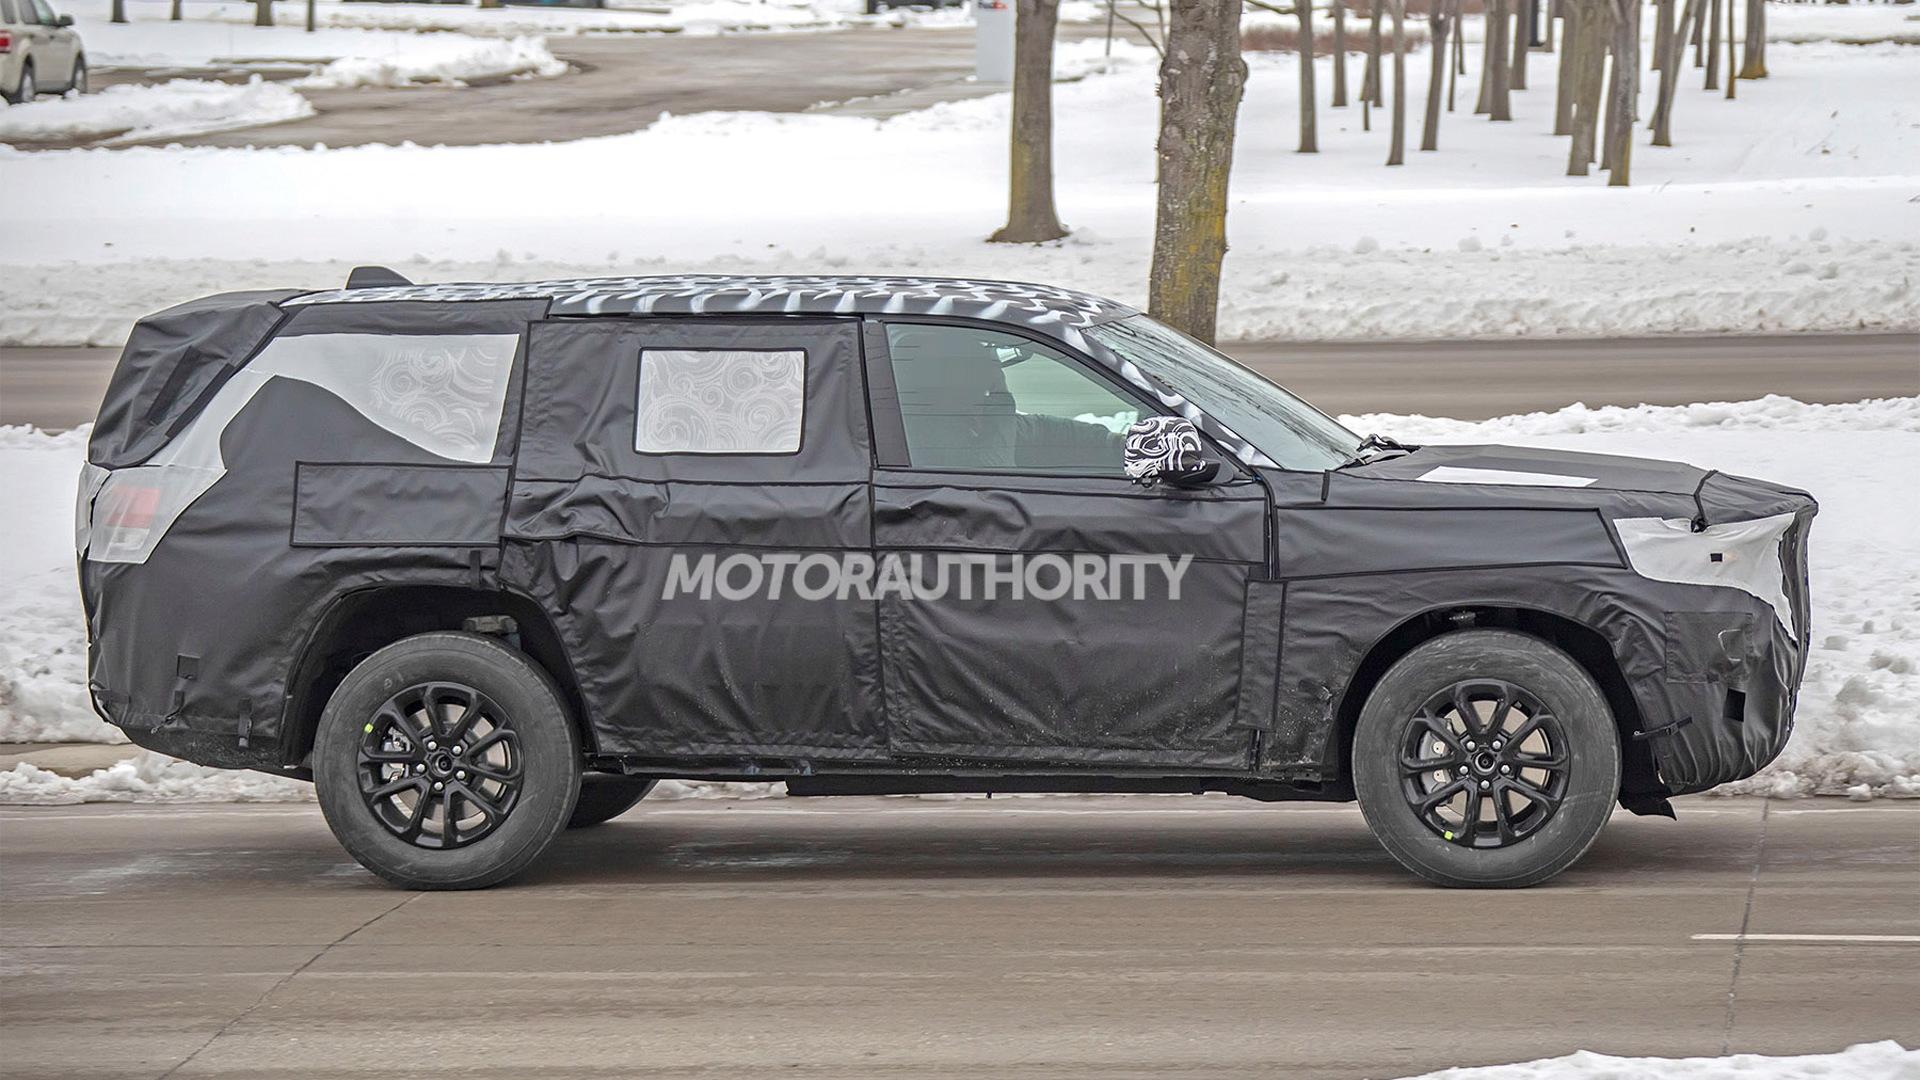 2021 Jeep Grand Cherokee-based 3-row SUV spy shots - Photo credit: S. Baldauf/SB-Medien